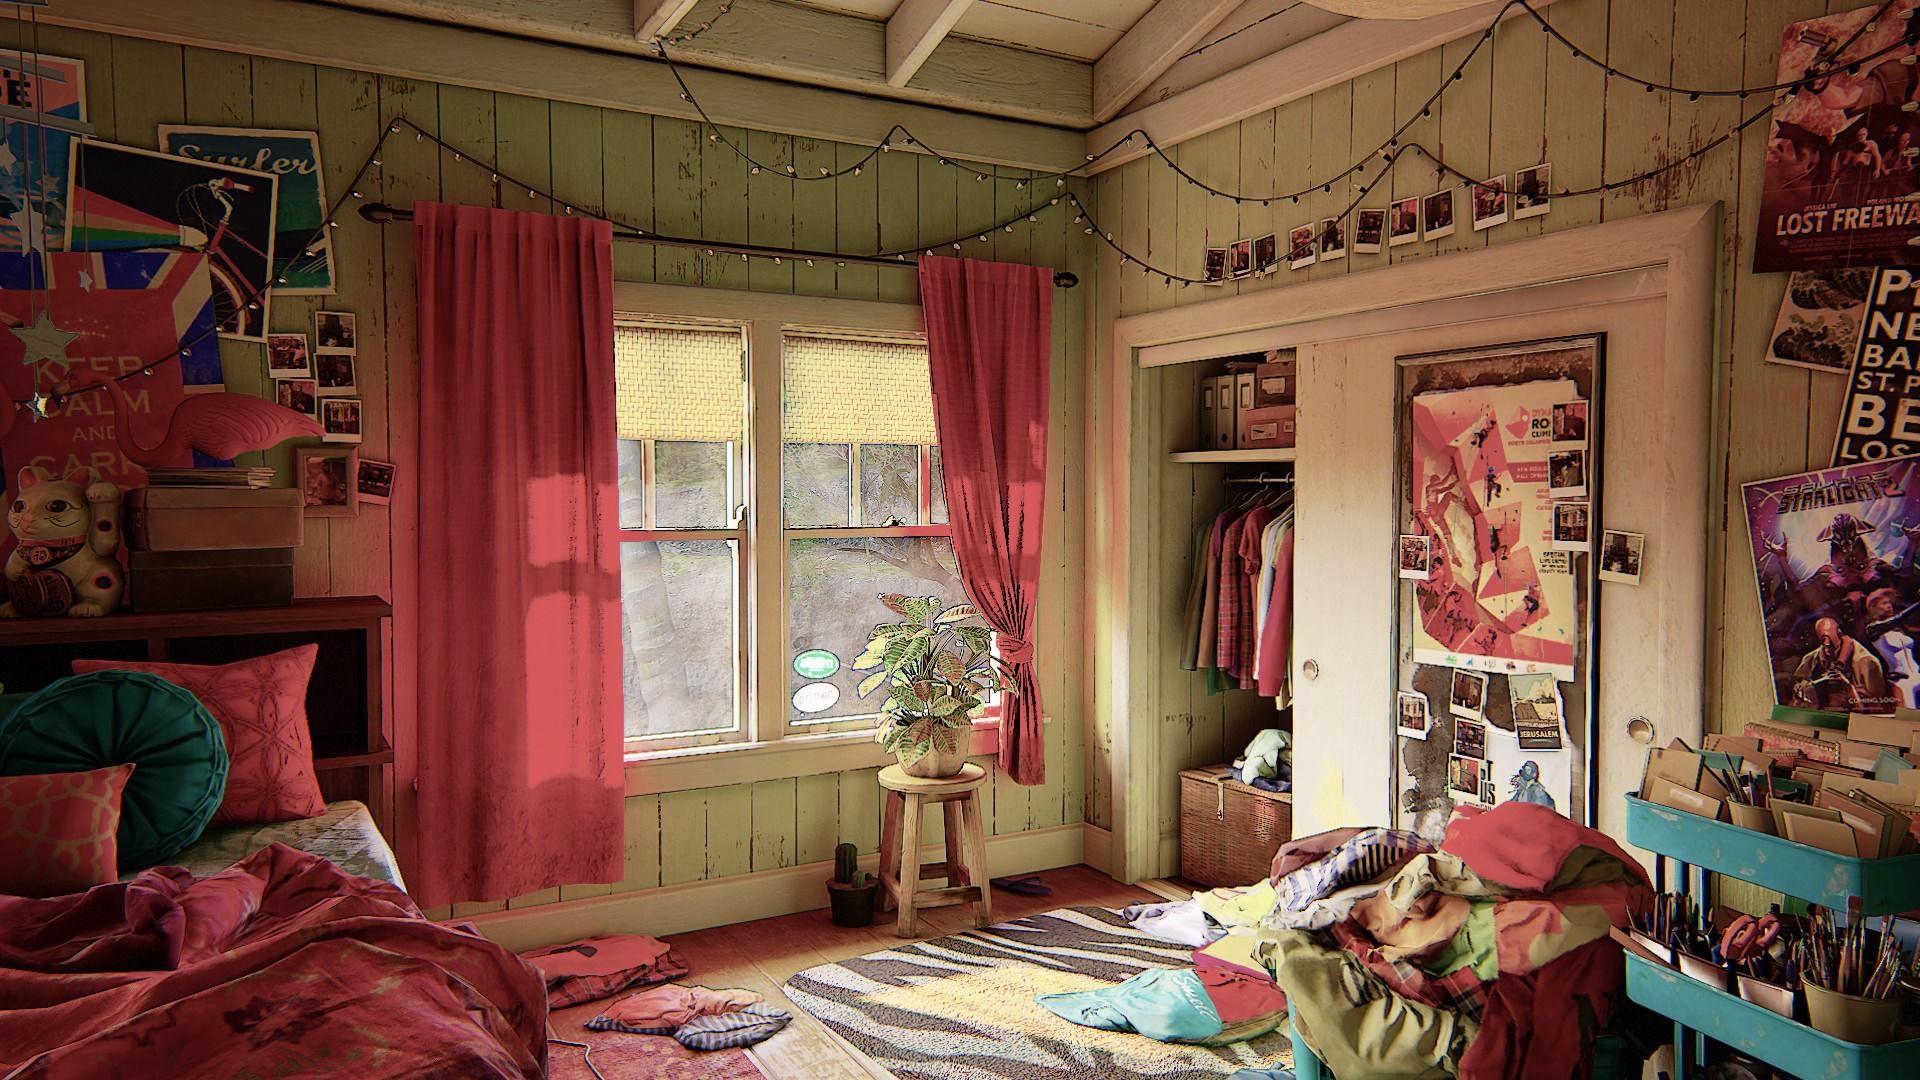 Uncharted bedroom Uncharted bedroom Uncharted